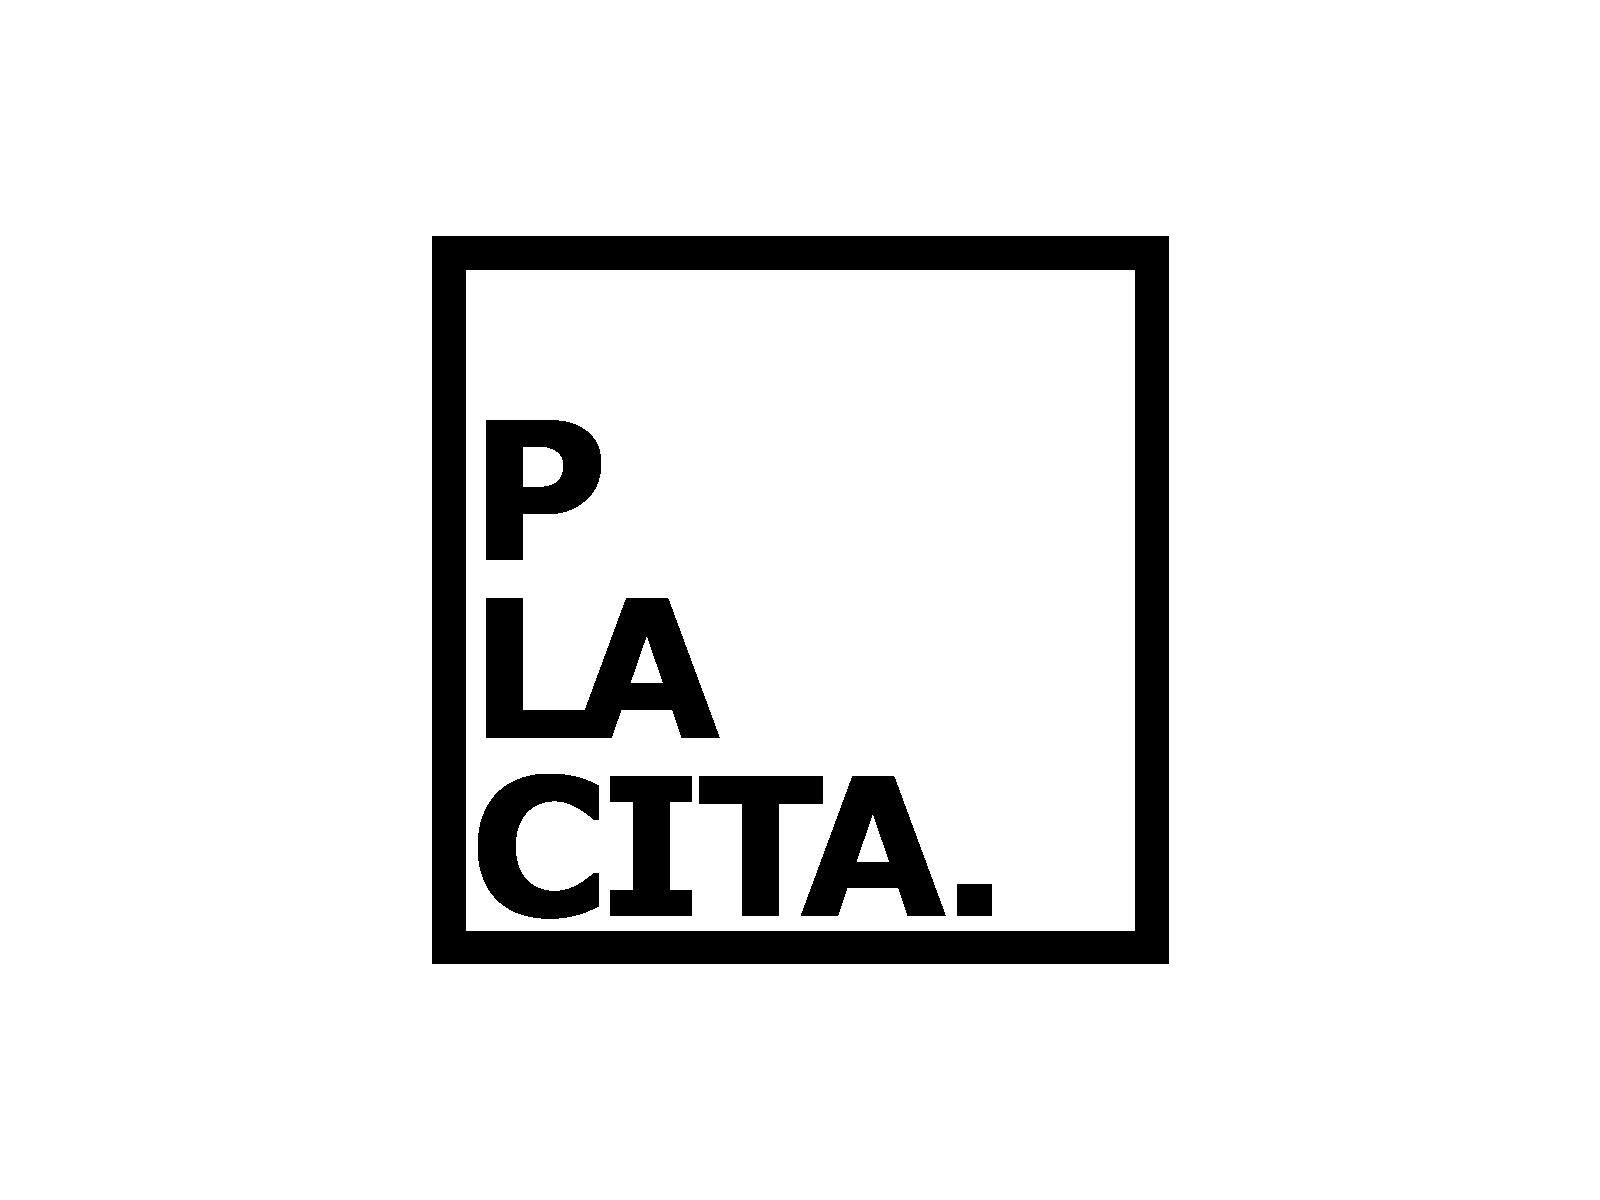 Placita Logo